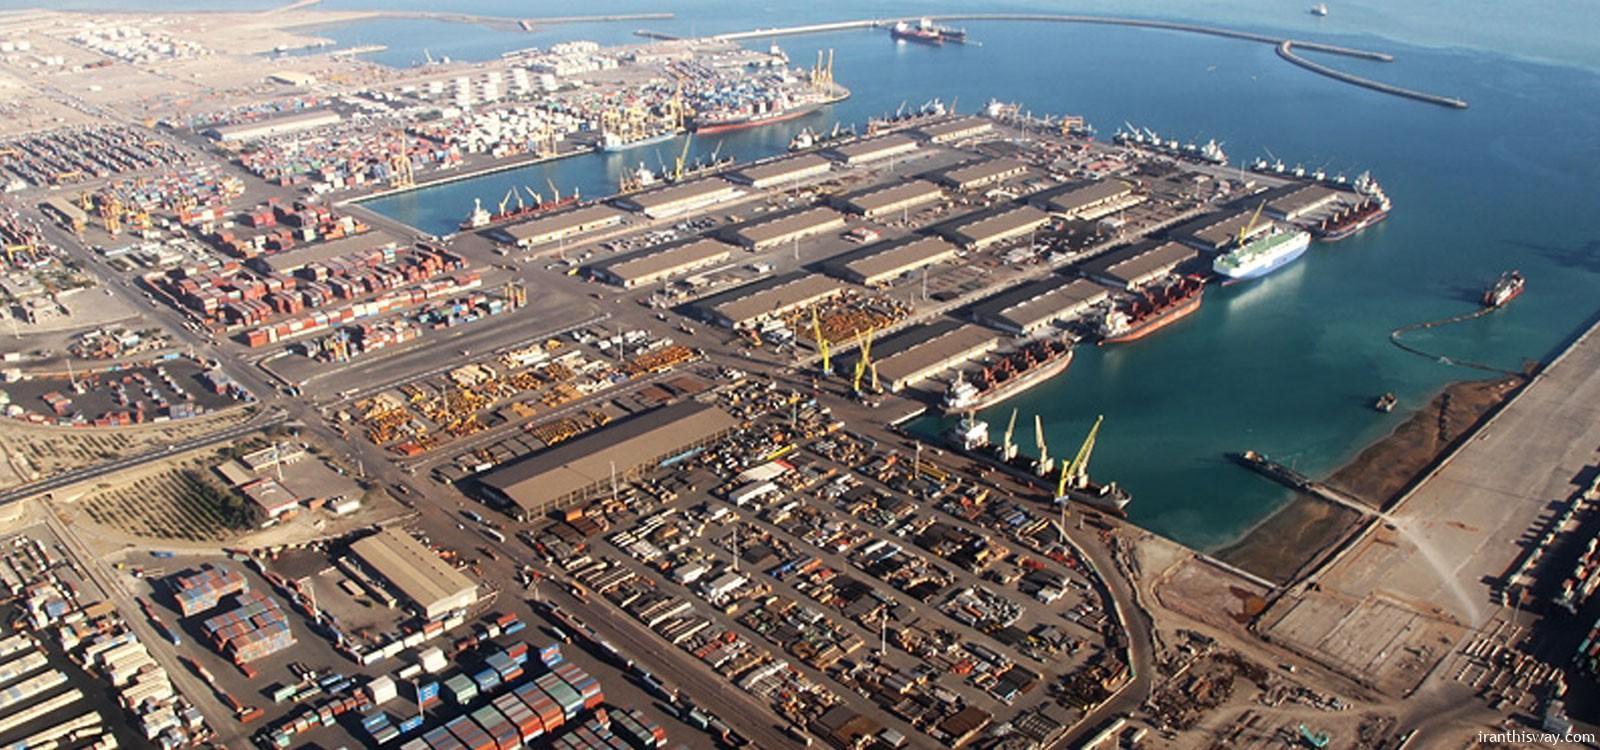 Bushehr Port/ Video | IRAN This Way